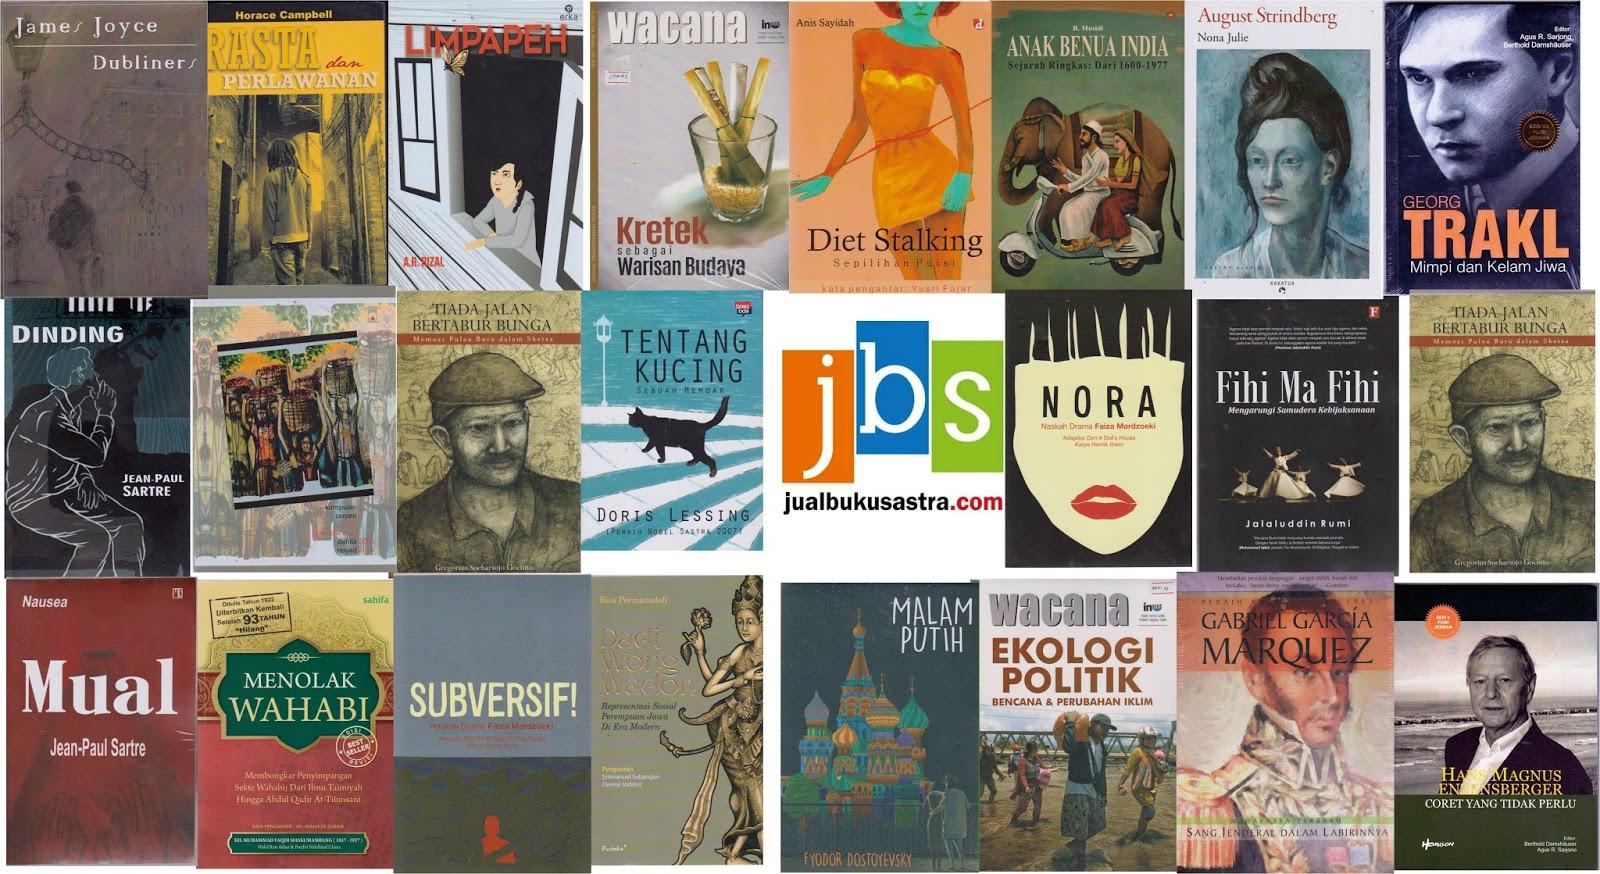 Jualan Buku Sastra Katalog Sastra Nonsastra Bulan April 2017